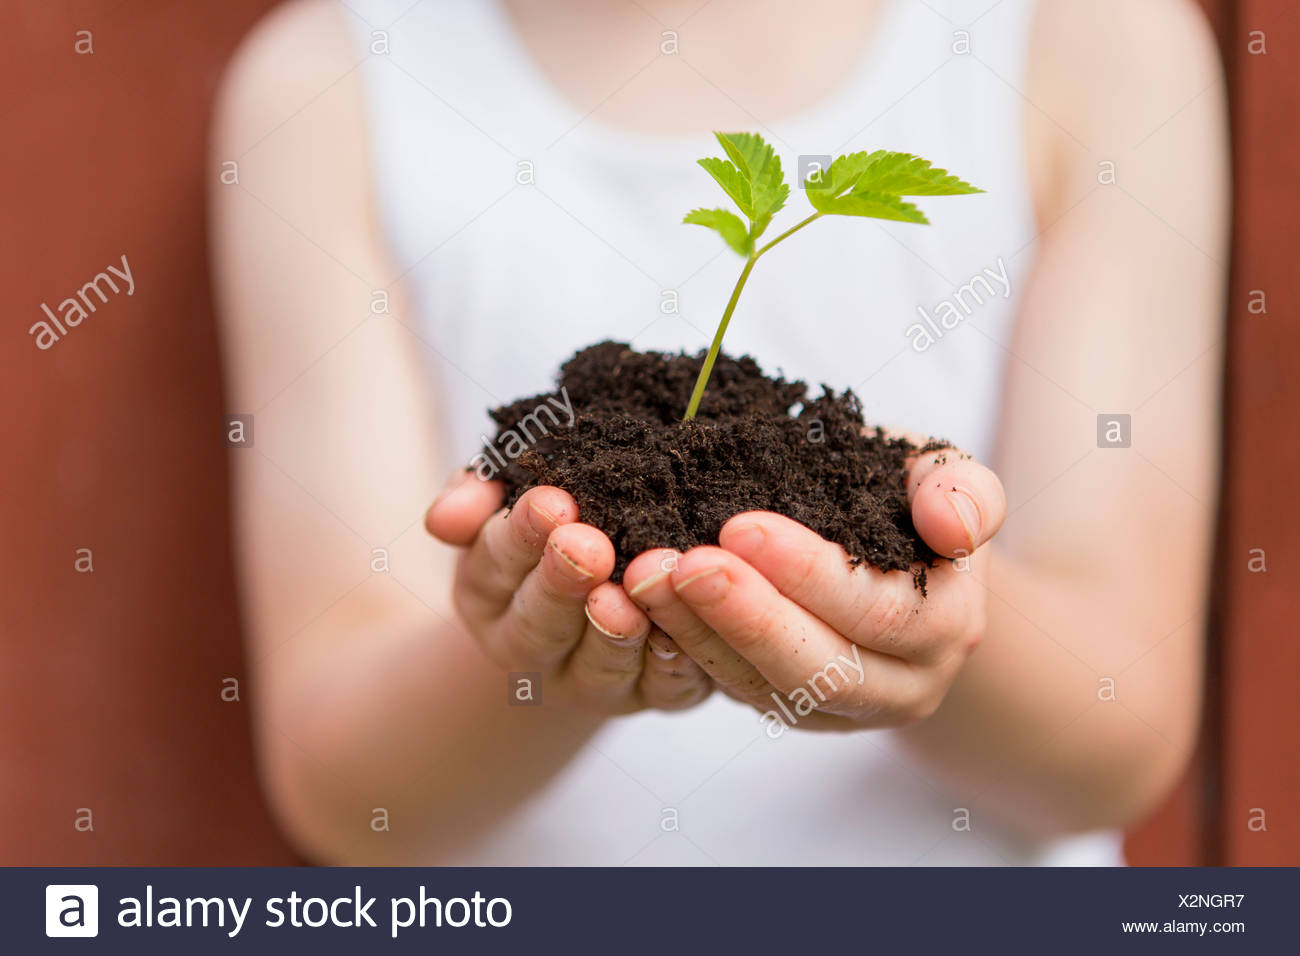 Girl holding seedling outdoors - Stock Image